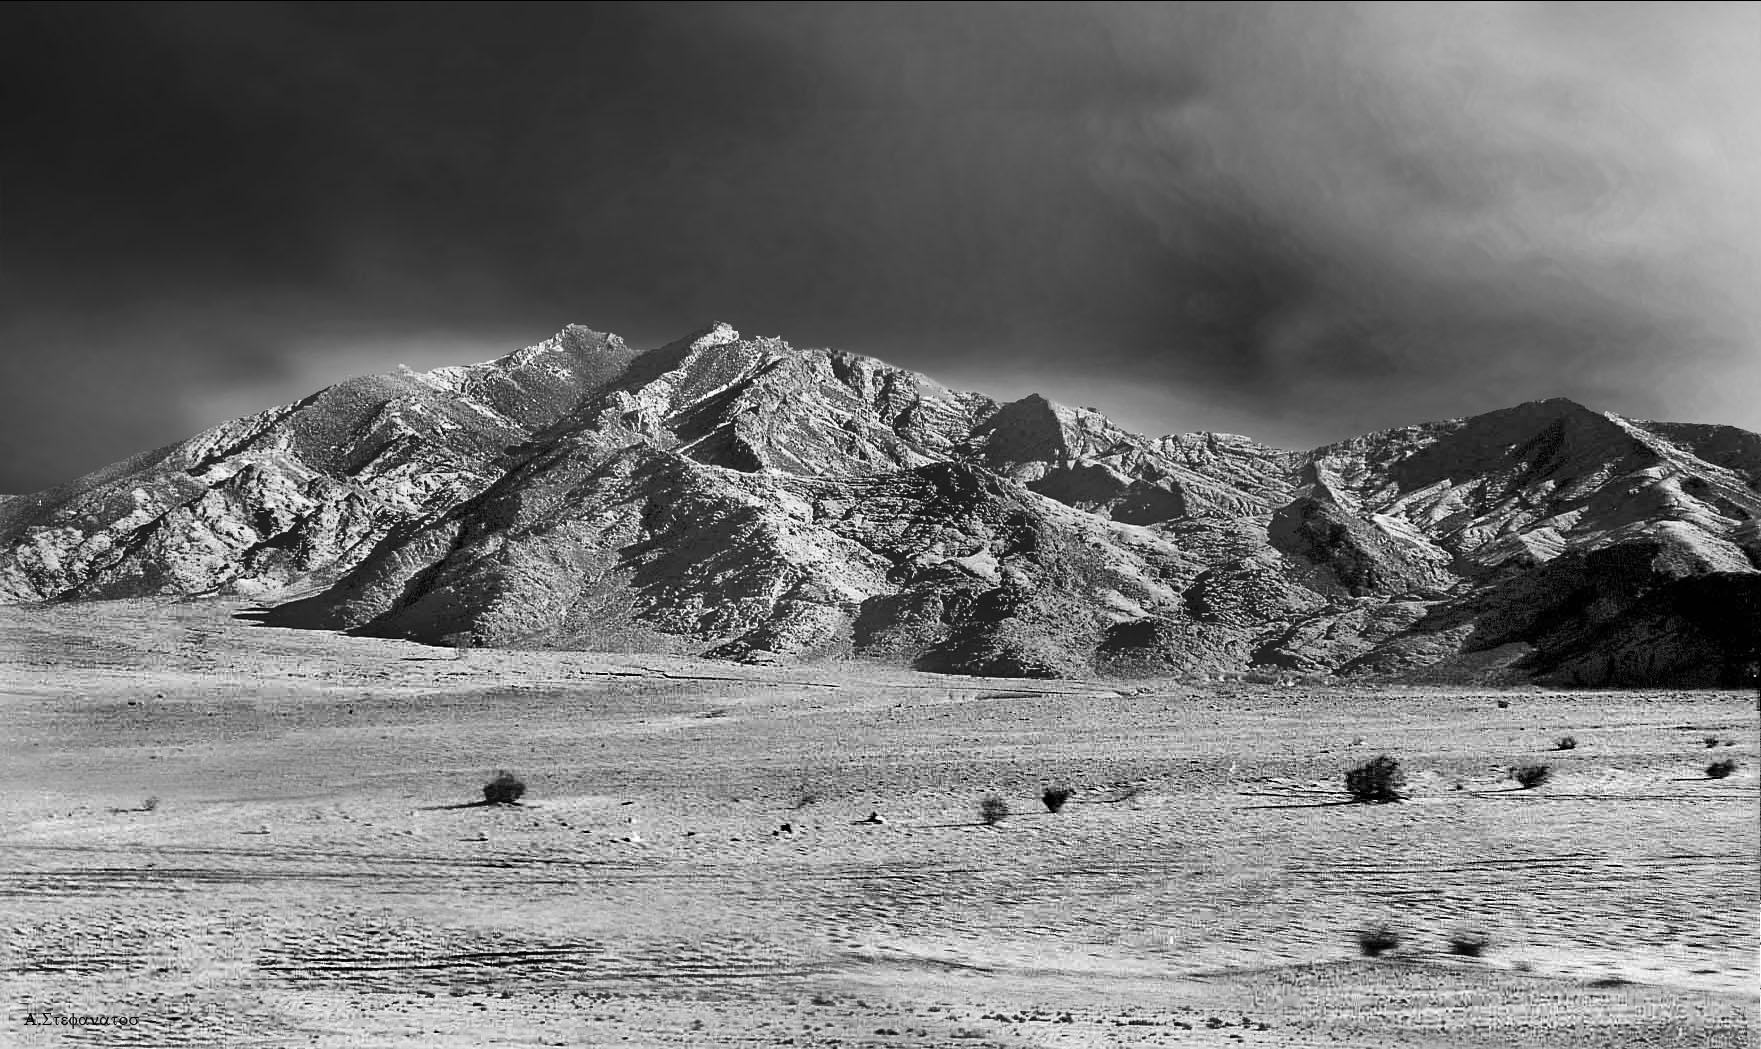 Sinai desert 2